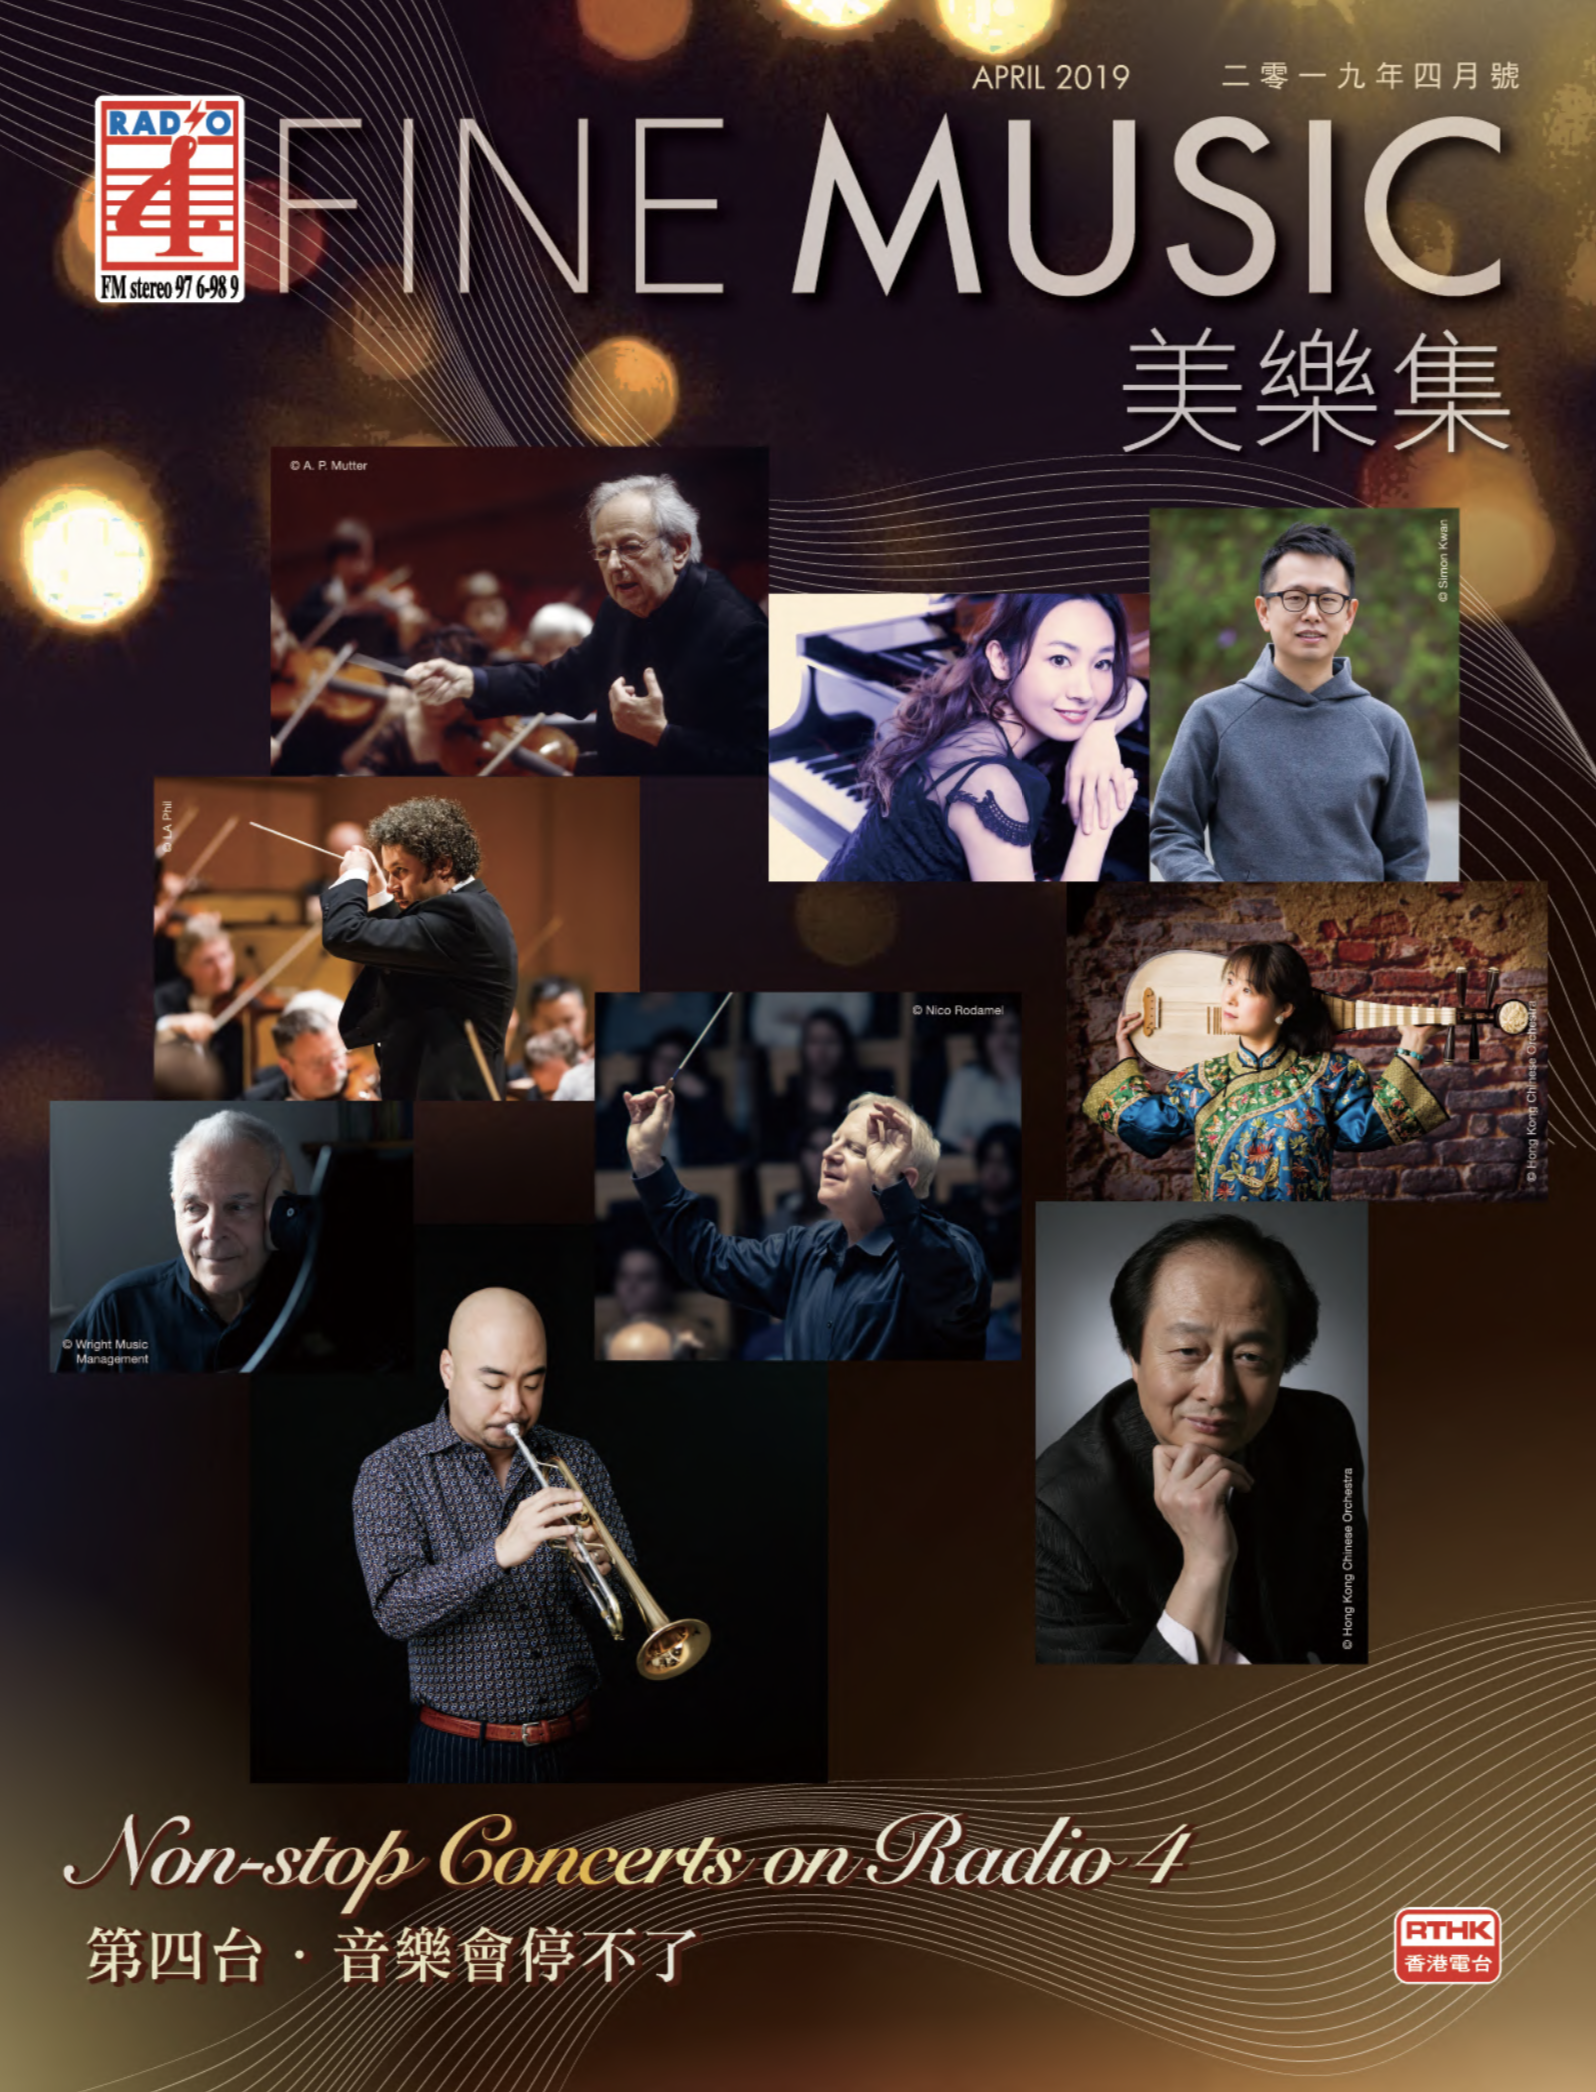 FINE MUSIC 美樂集 - Music magazine by RTHK 香港電台April, 2019